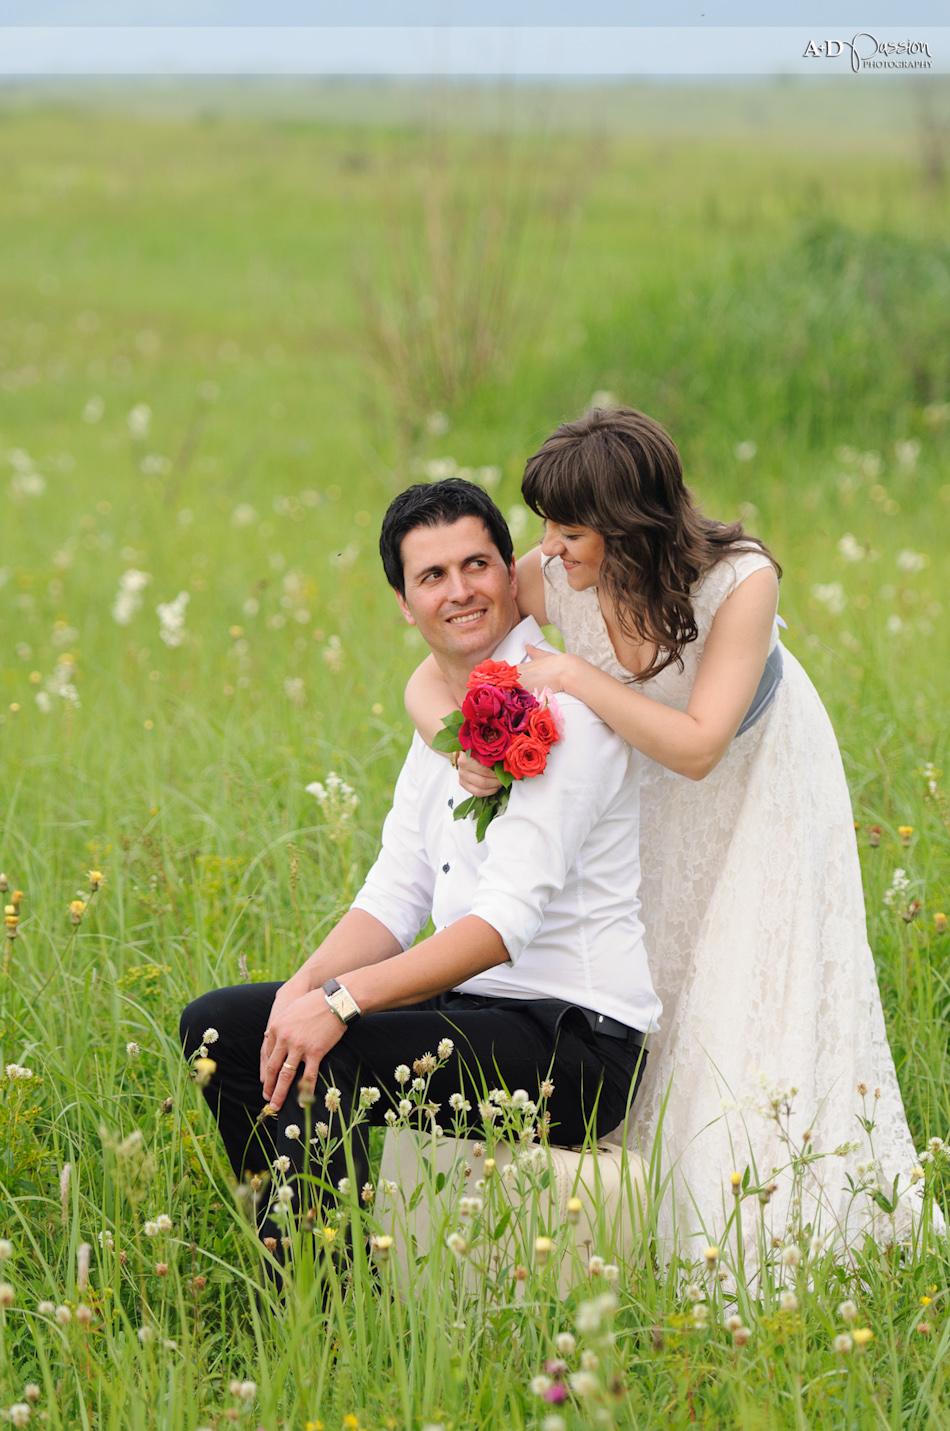 AD Passion Photography | 07042012_fotograf-profesionist-nunta_after-wedding_carmen-si-costi_0025 | Adelin, Dida, fotograf profesionist, fotograf de nunta, fotografie de nunta, fotograf Timisoara, fotograf Craiova, fotograf Bucuresti, fotograf Arad, nunta Timisoara, nunta Arad, nunta Bucuresti, nunta Craiova